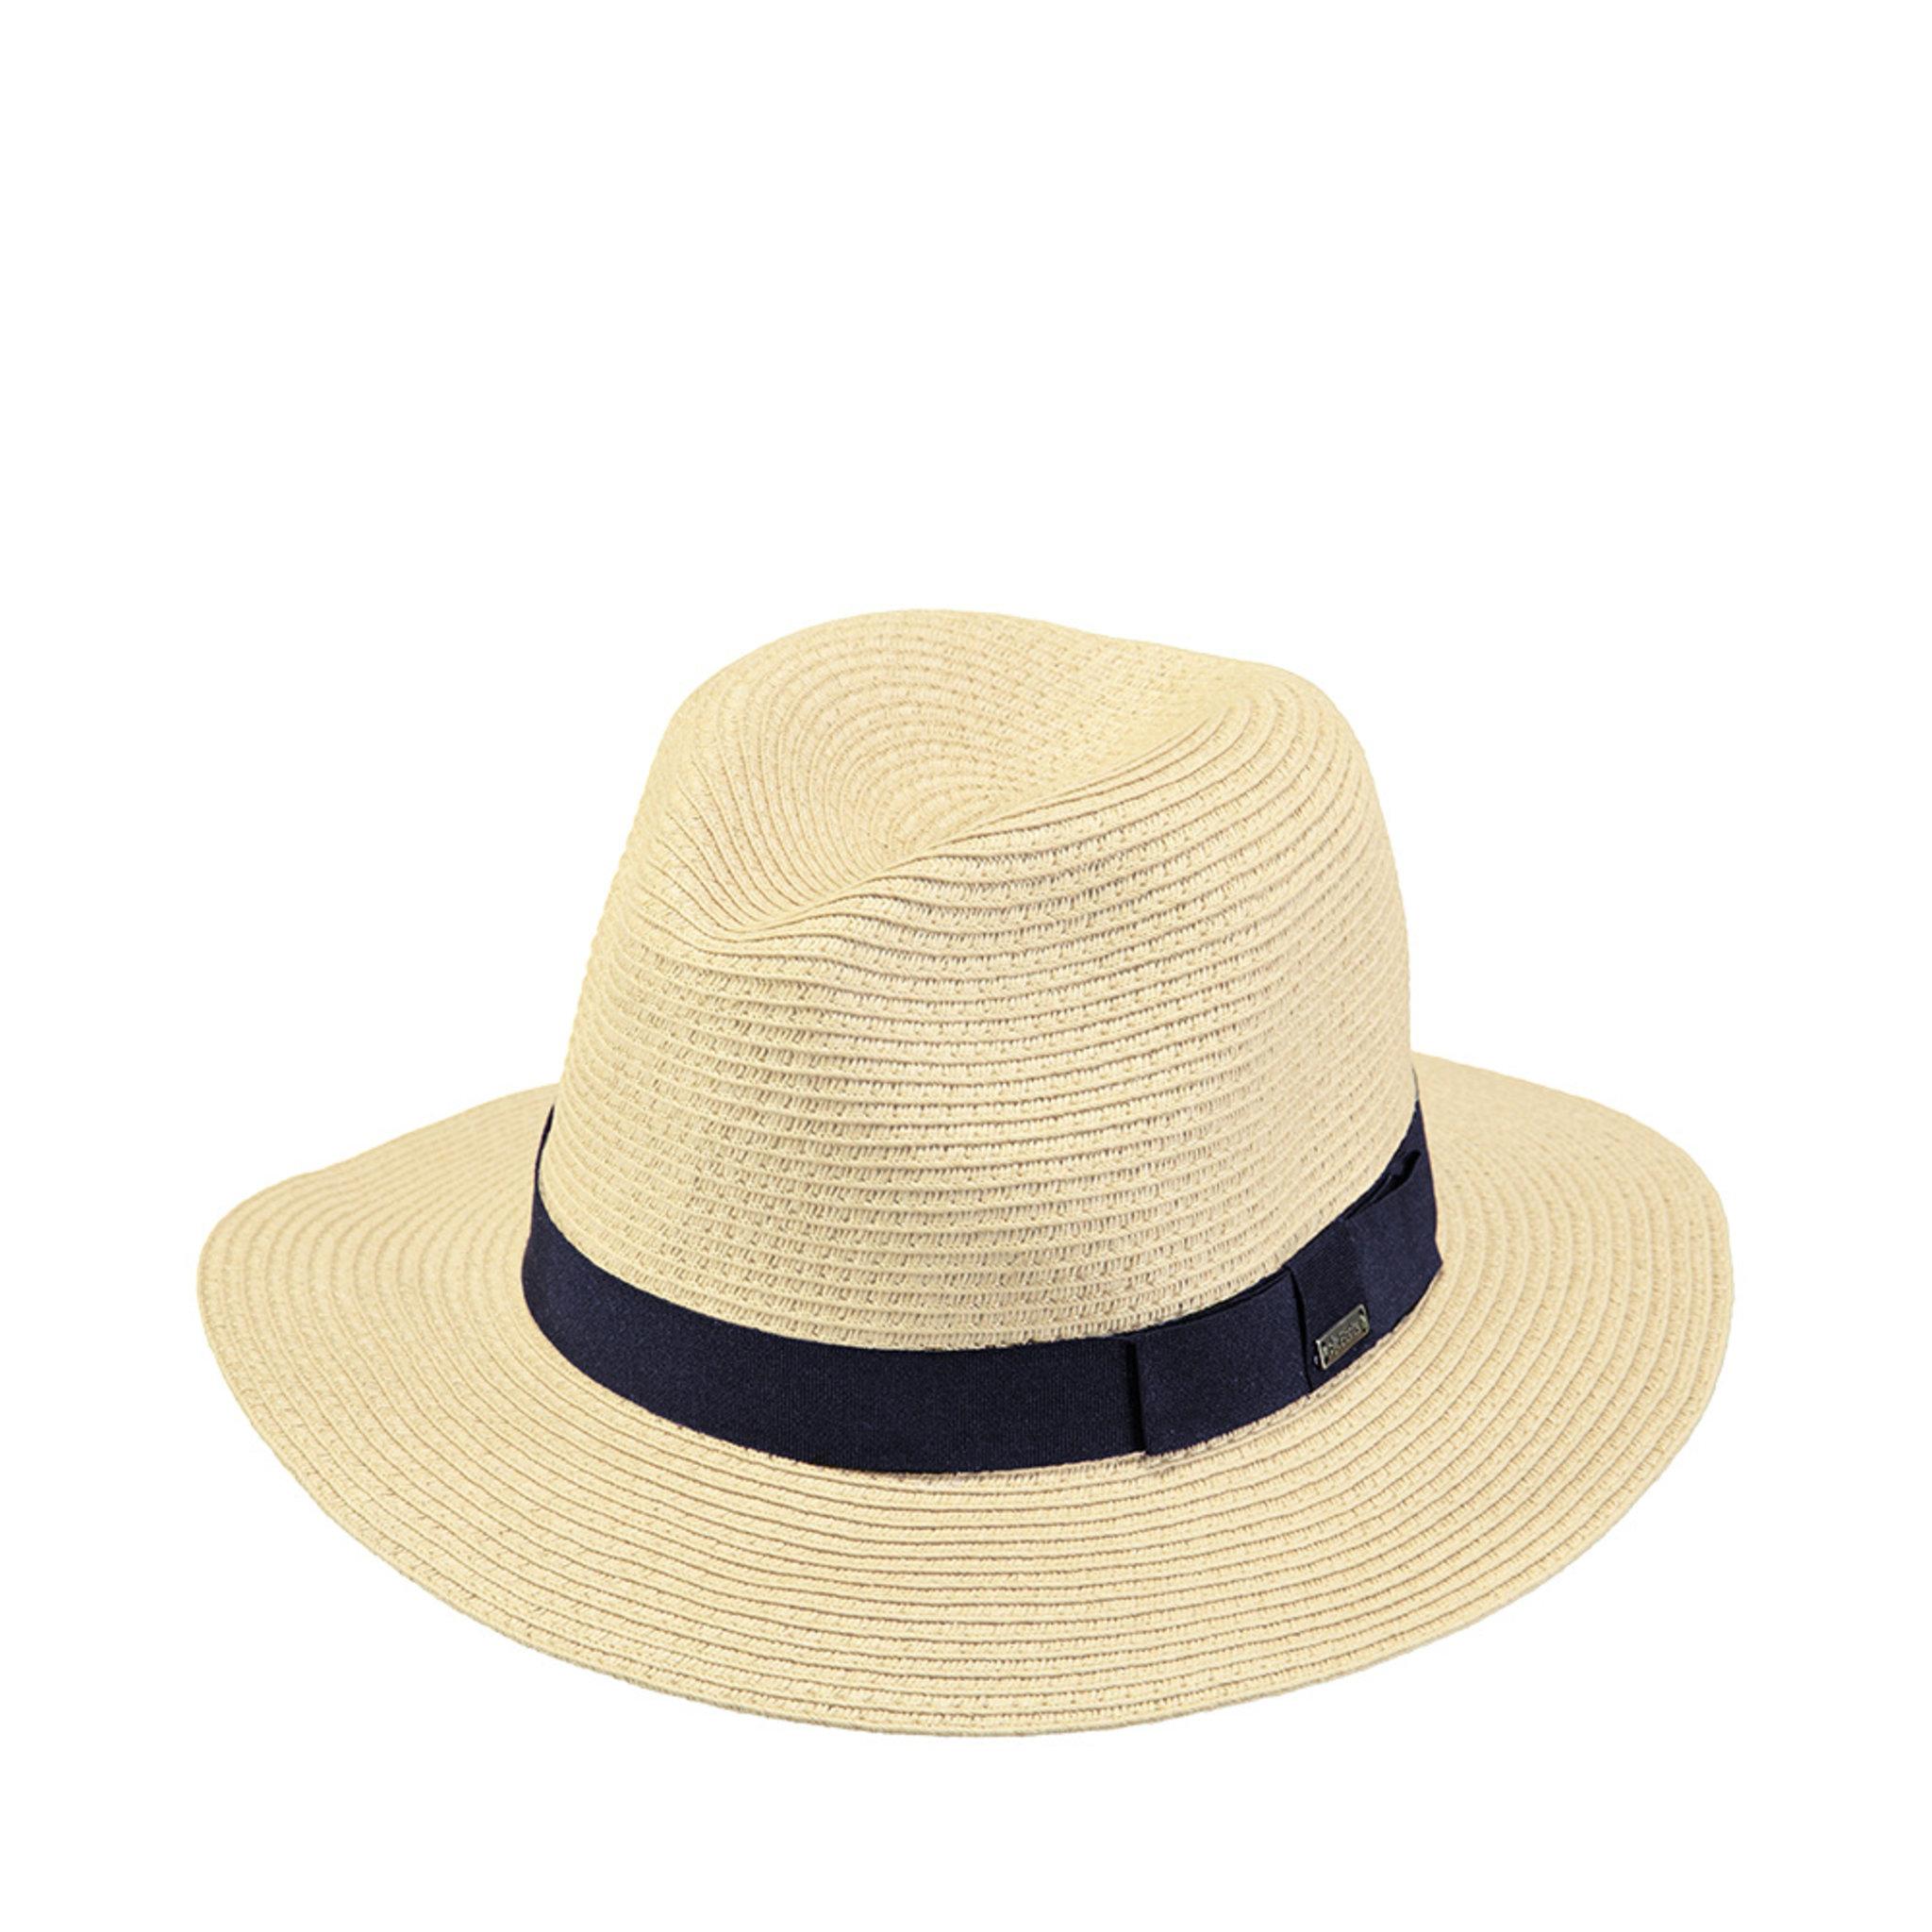 Hatt Aveloz - Mössor   hattar - Köp online på åhlens.se! 99dc20a0503ea